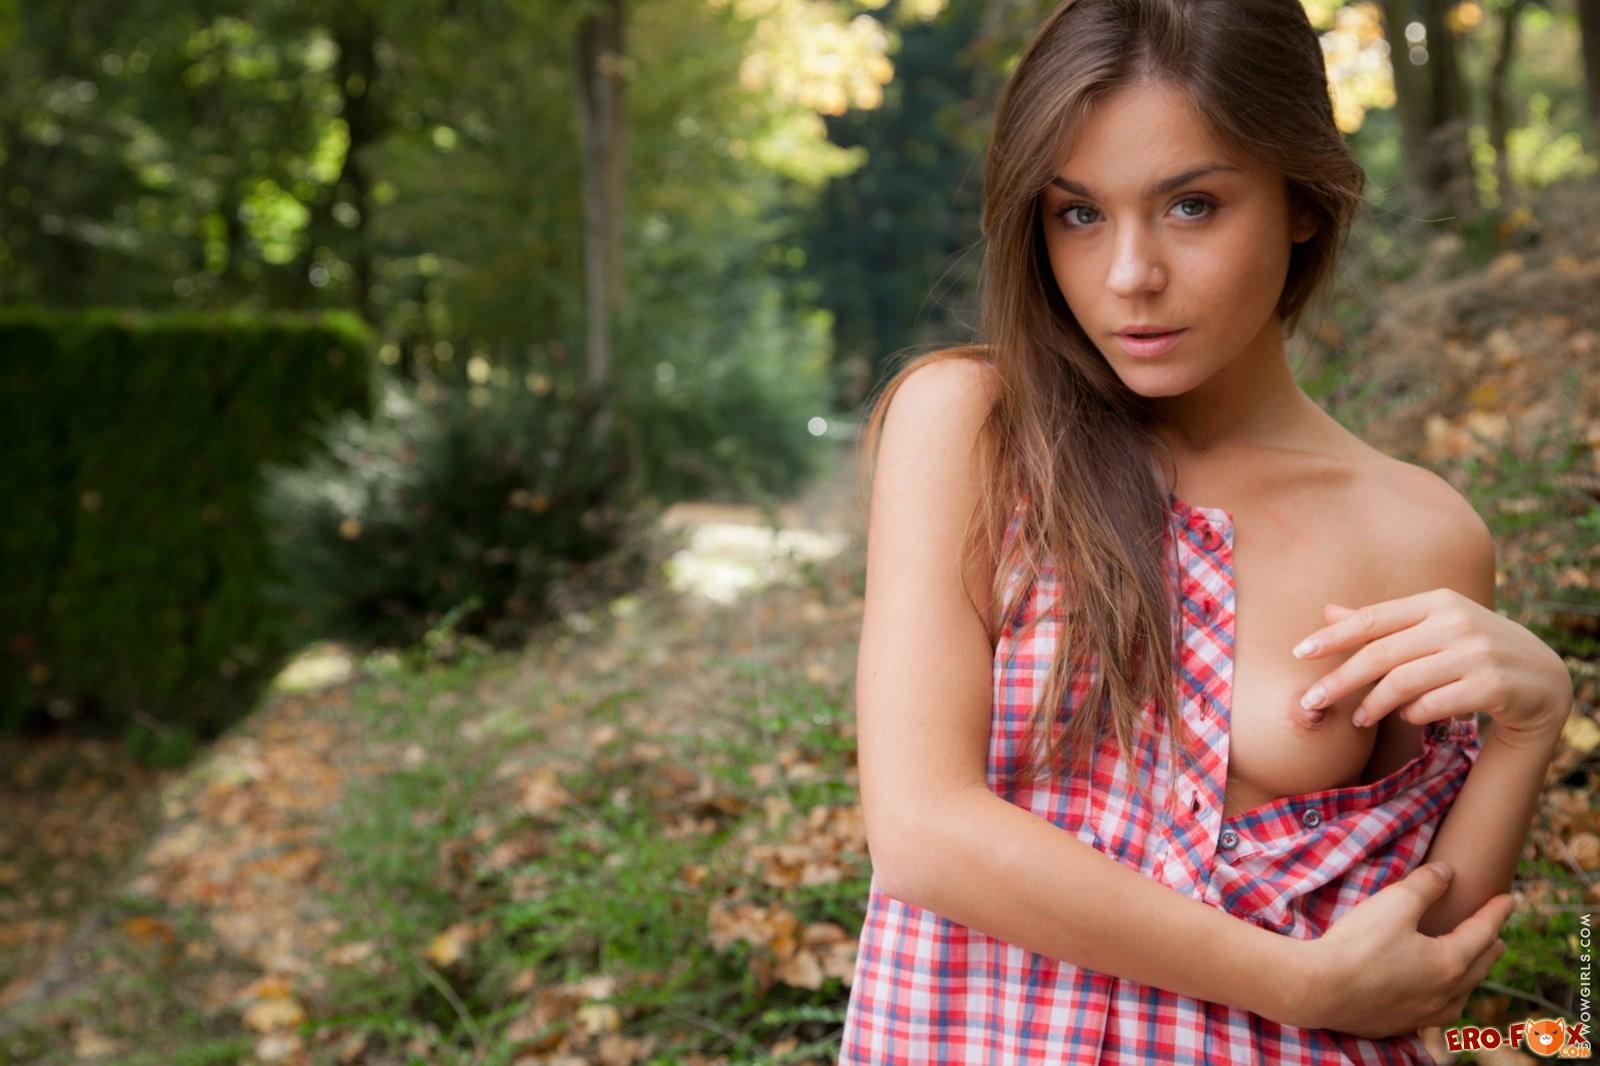 Девушка сняла трусики в лесу .